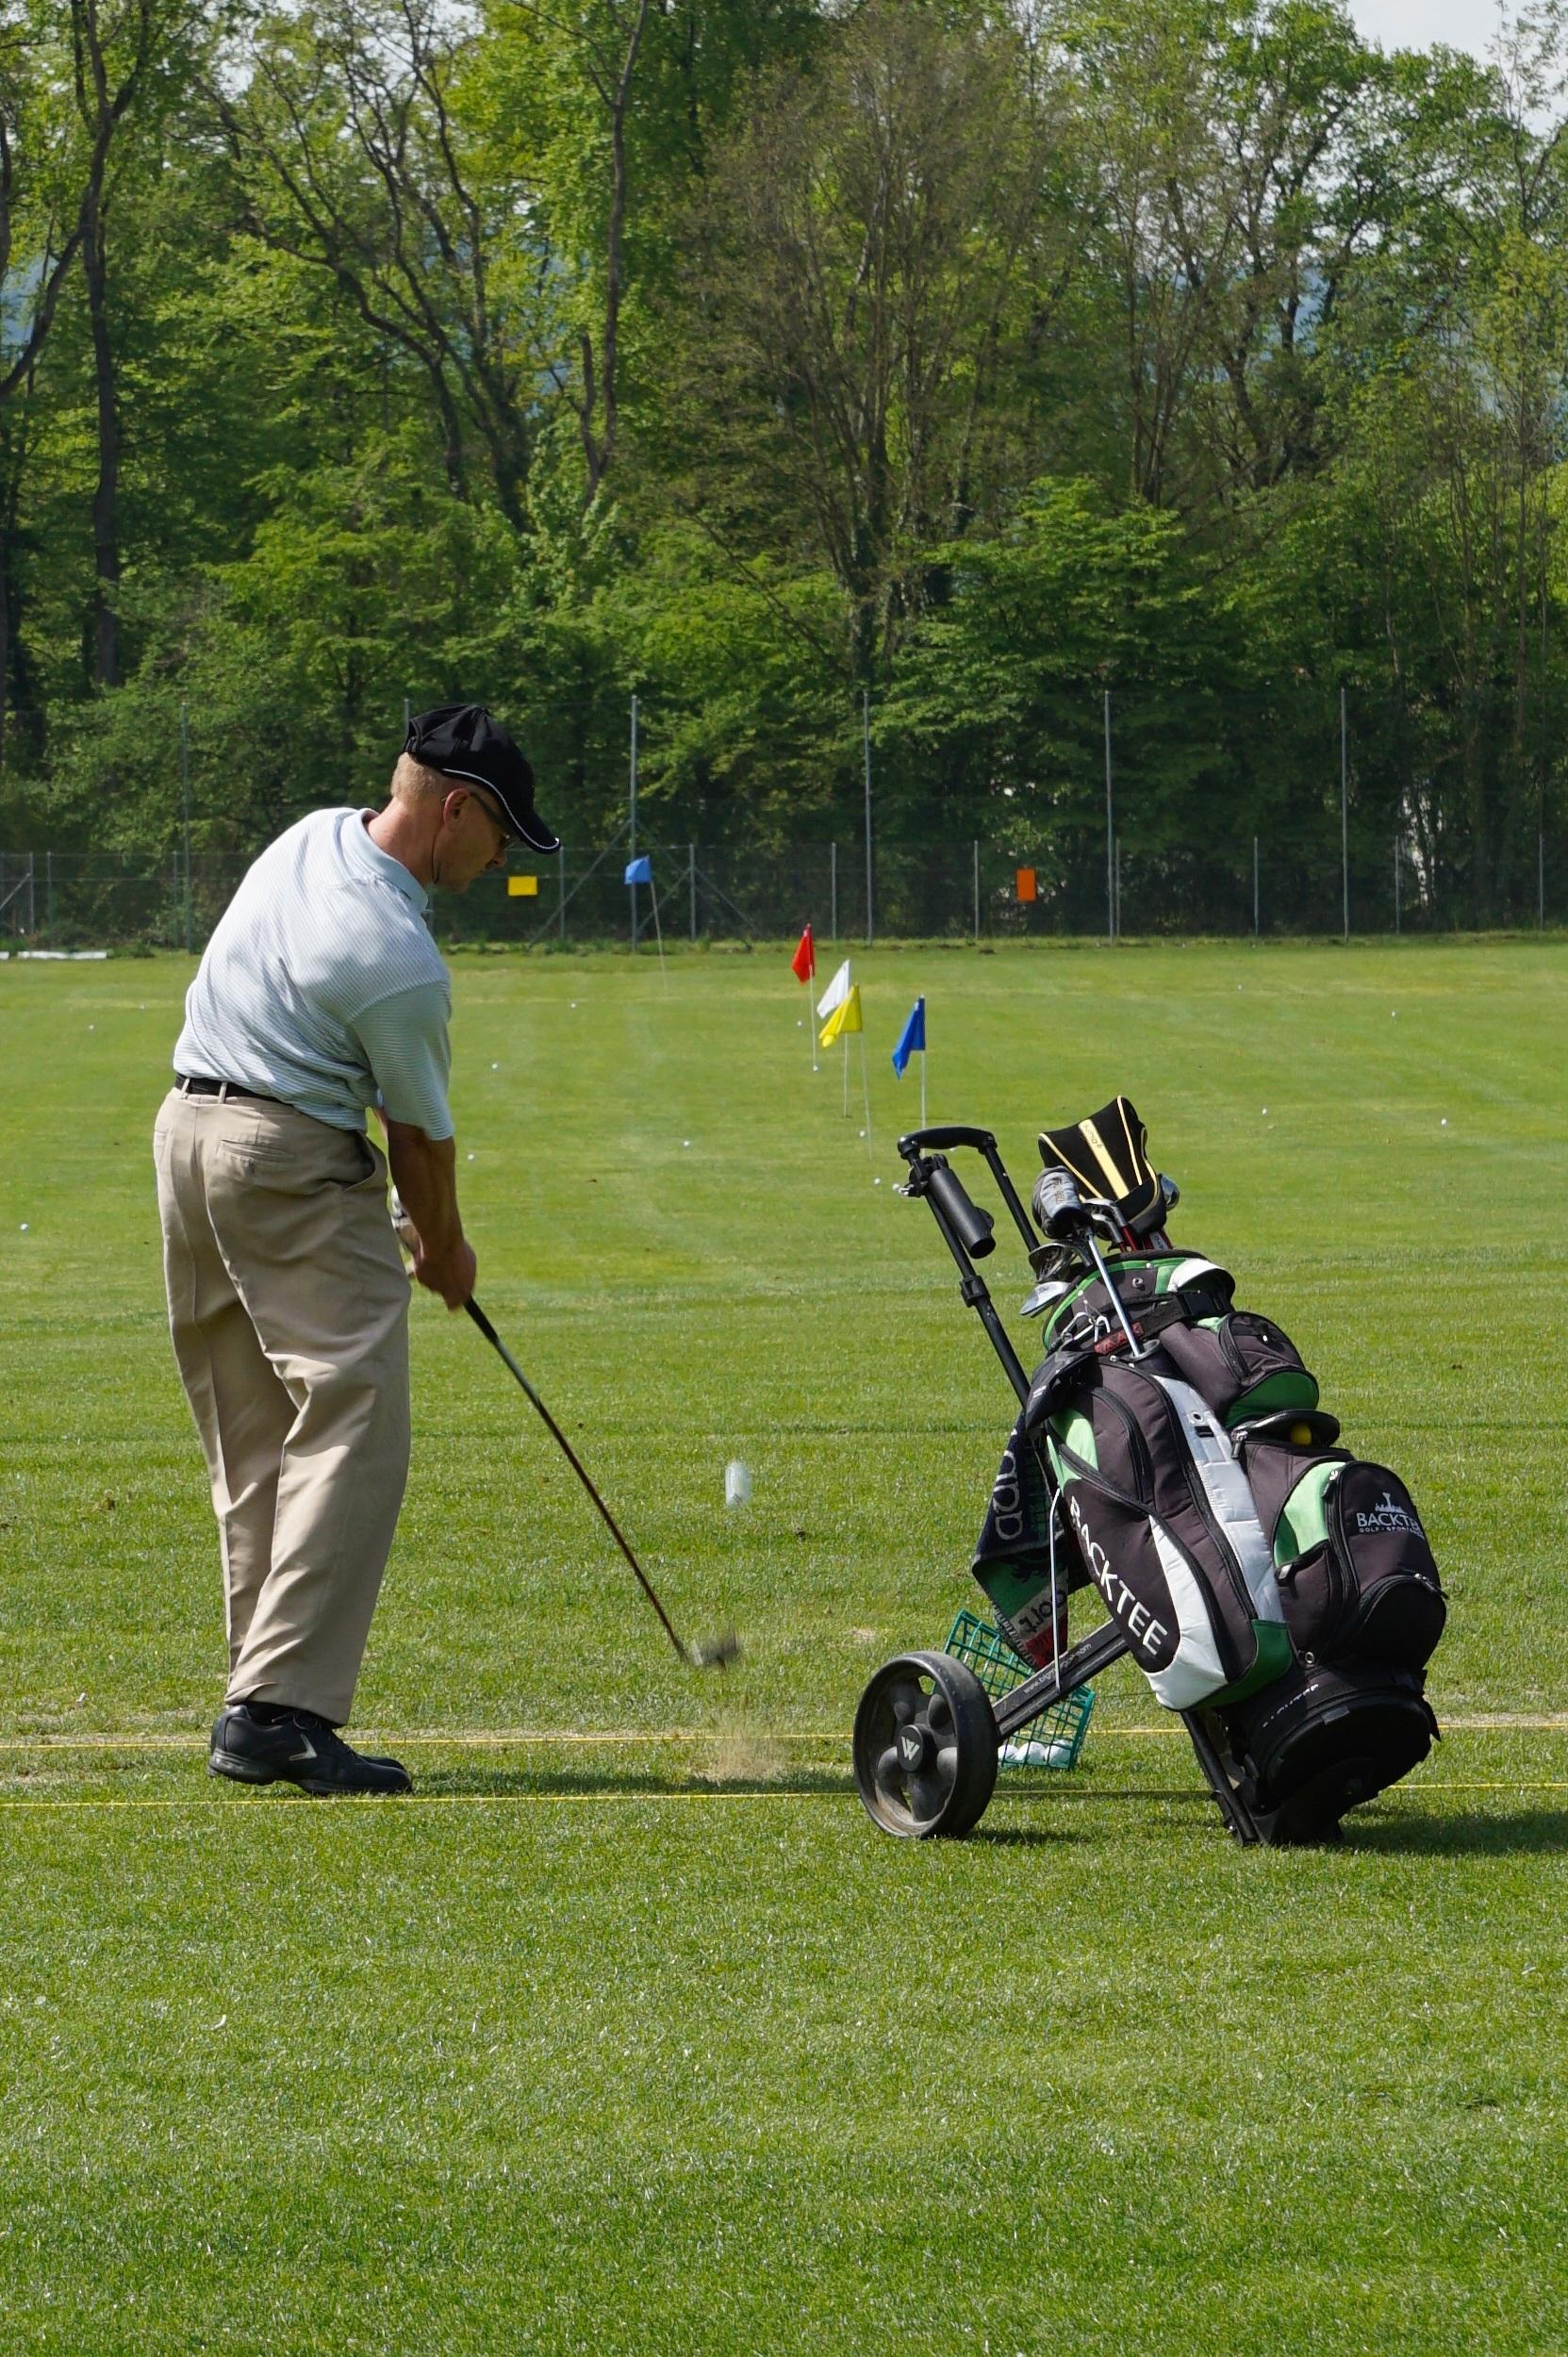 Free Images : grass, sport, lawn, vehicle, golf ball, golf club